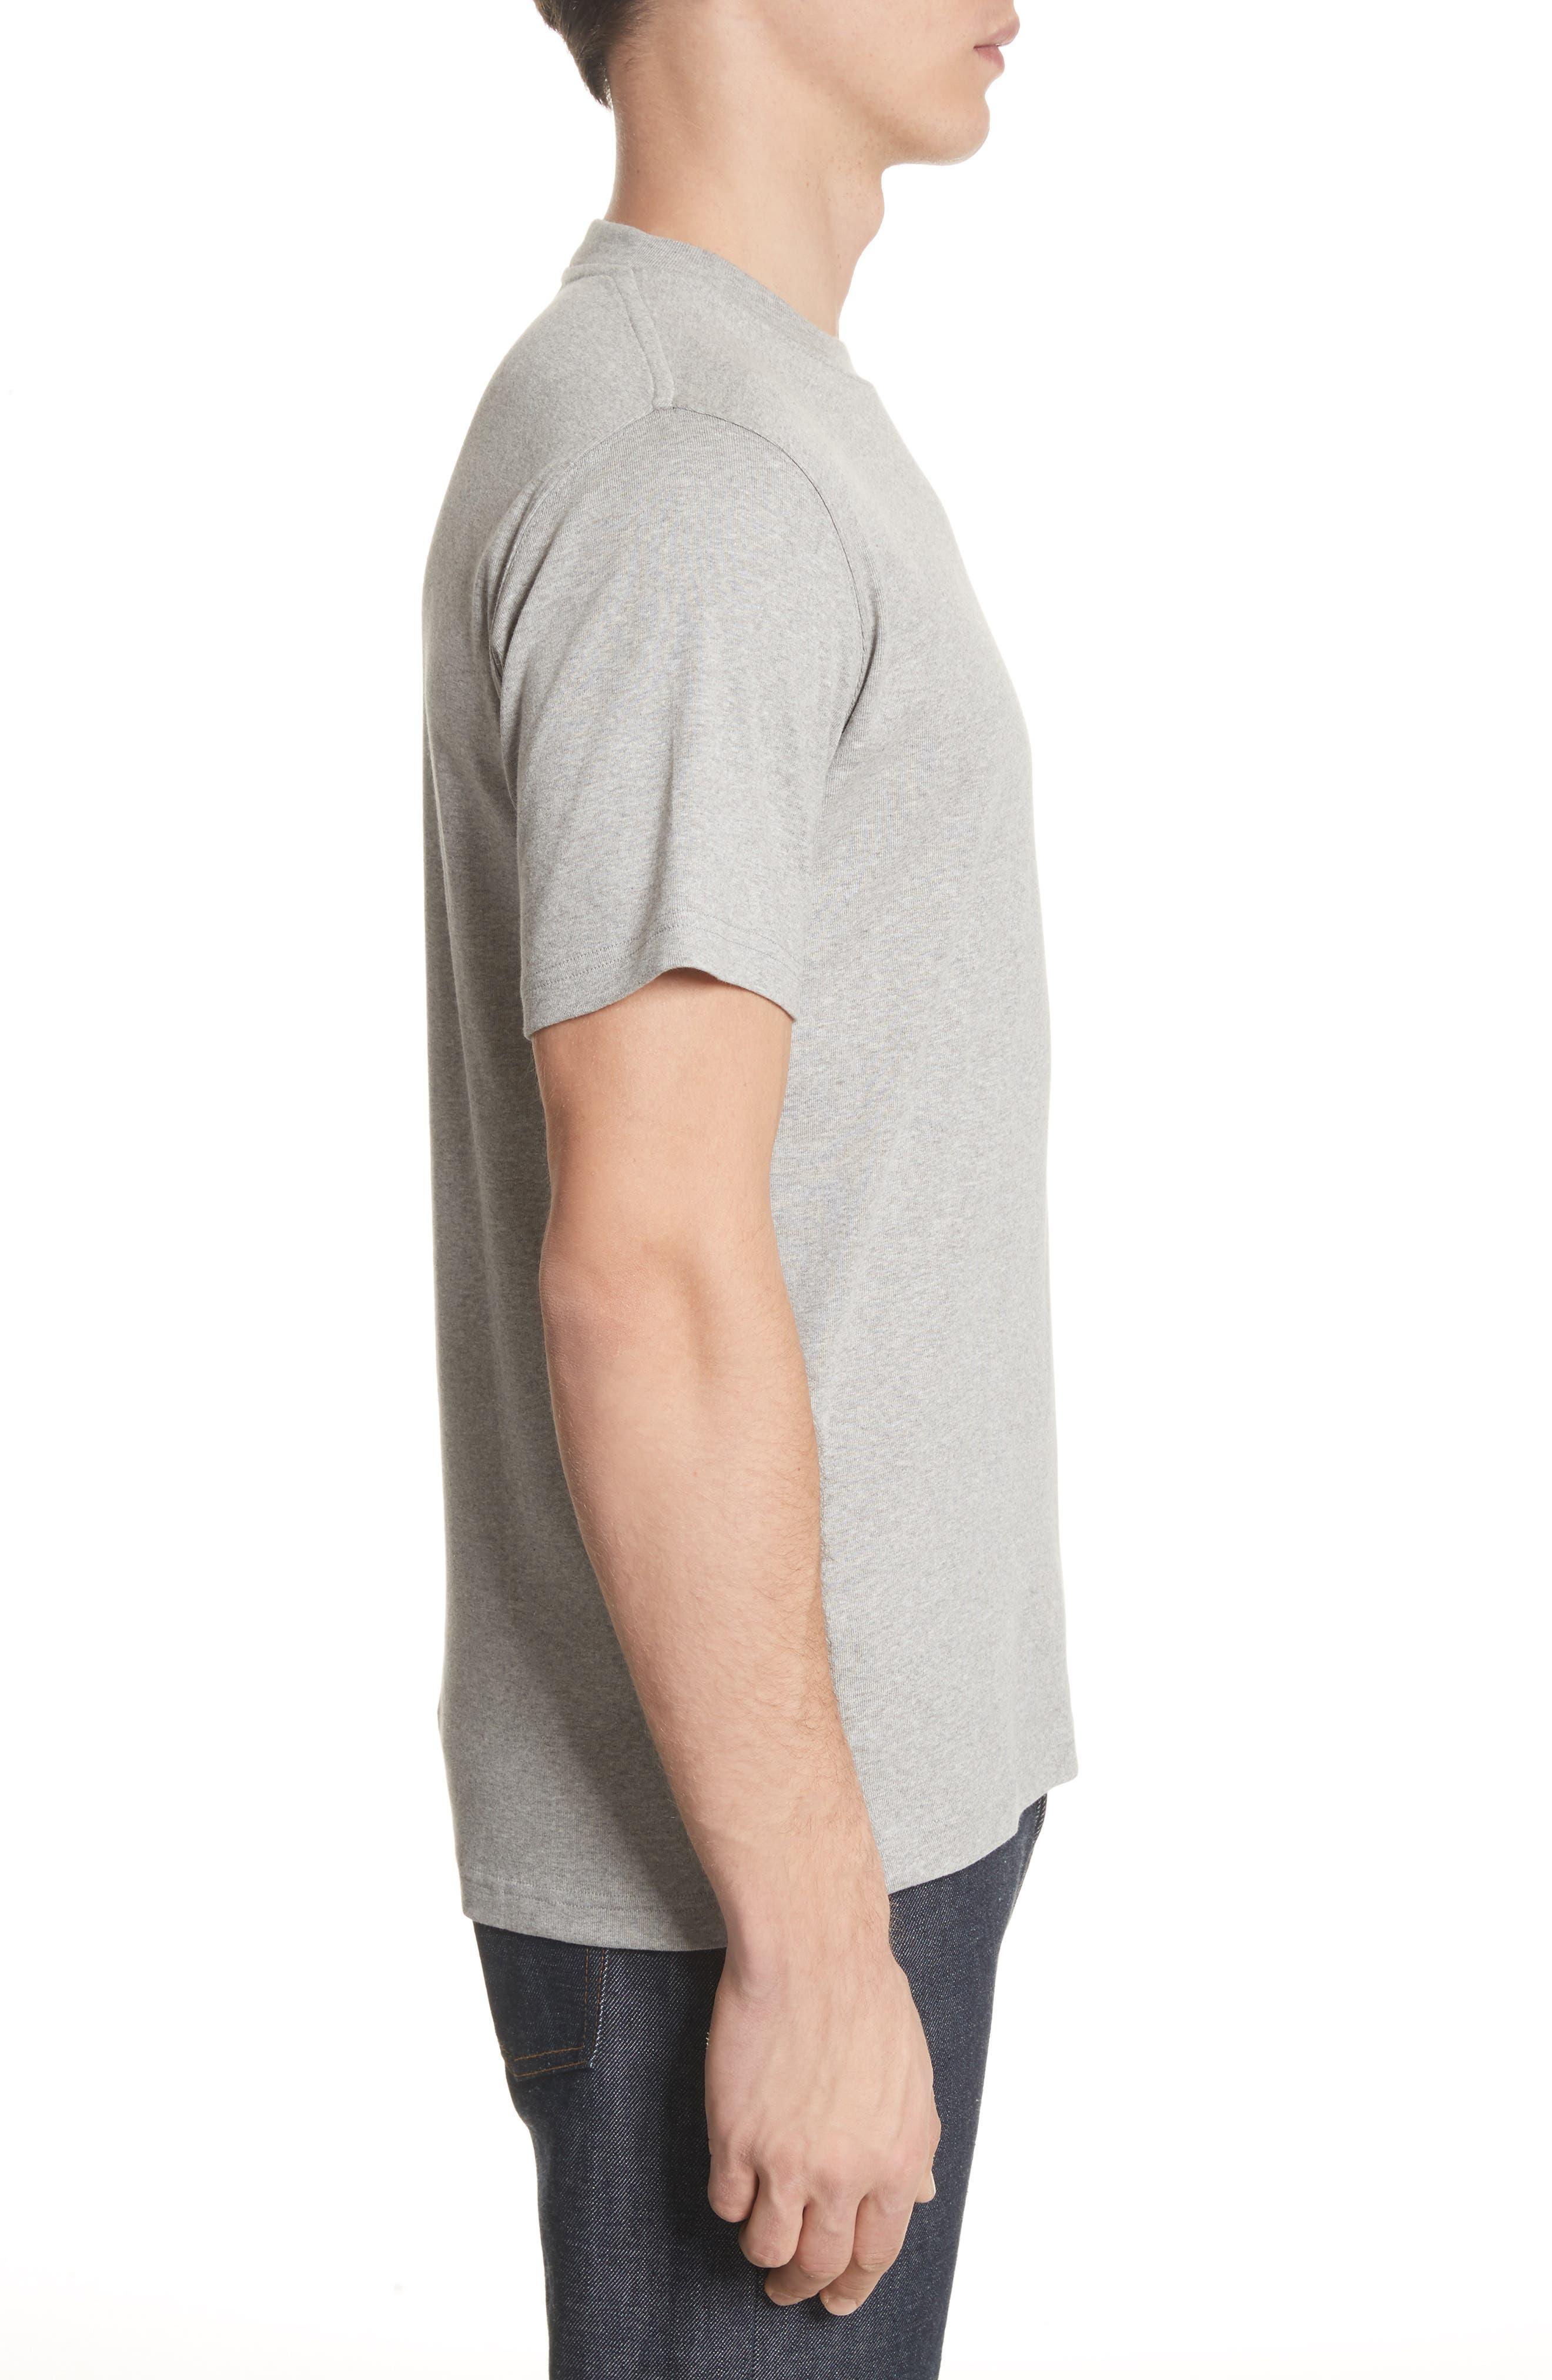 James T-Shirt,                             Alternate thumbnail 3, color,                             021